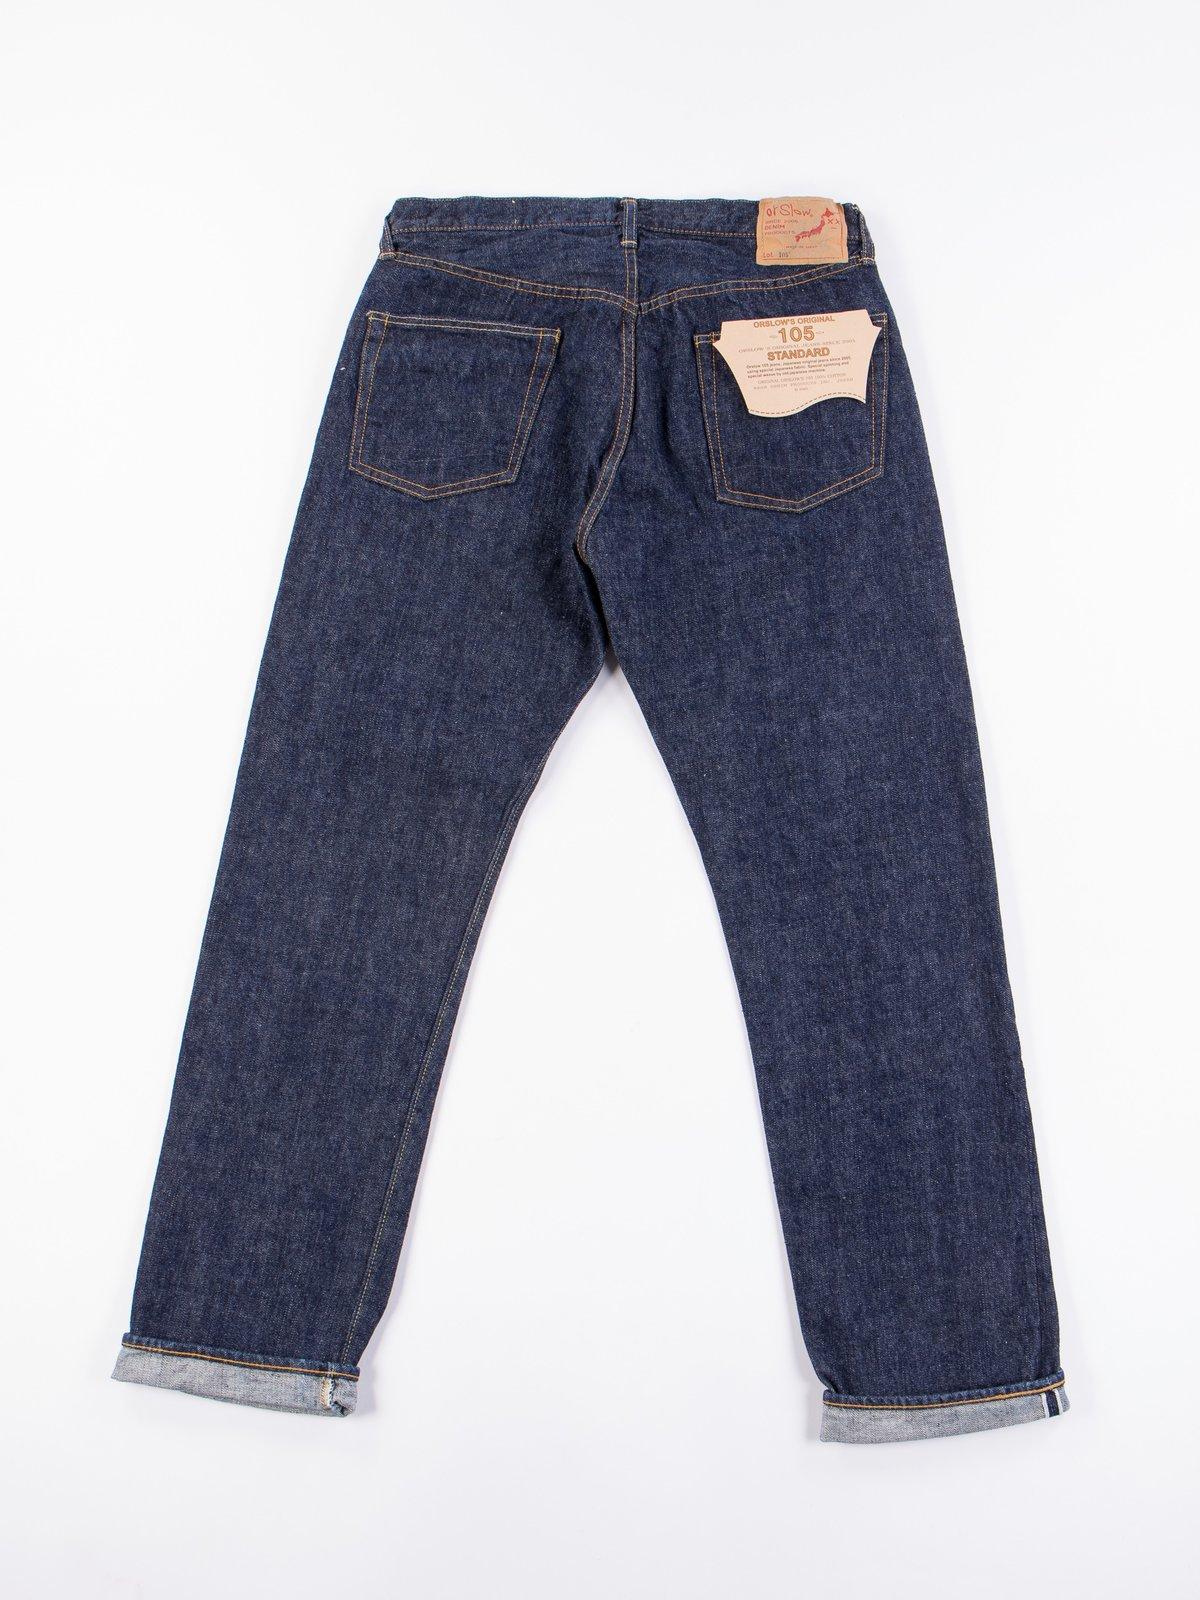 Indigo One Wash 105 Standard 5 Pocket Jean - Image 8